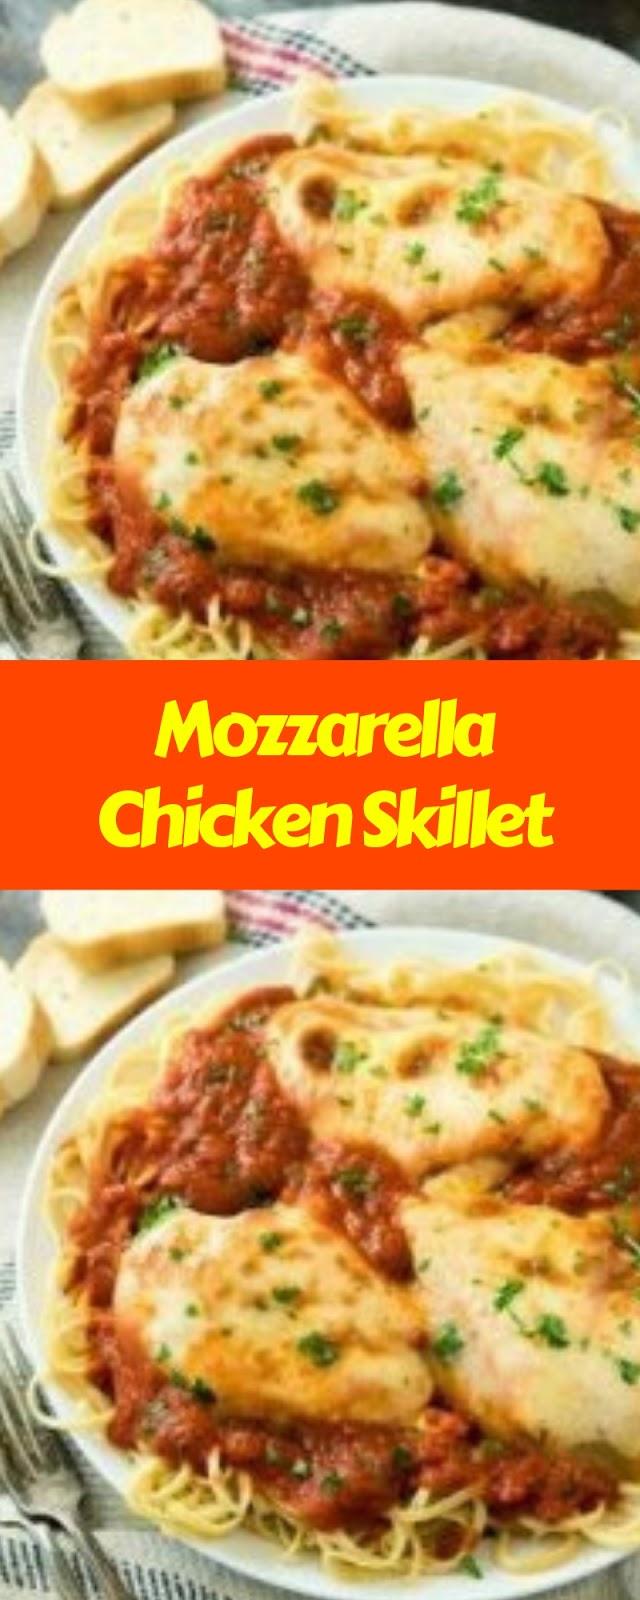 Mozzarella Chicken Skillet